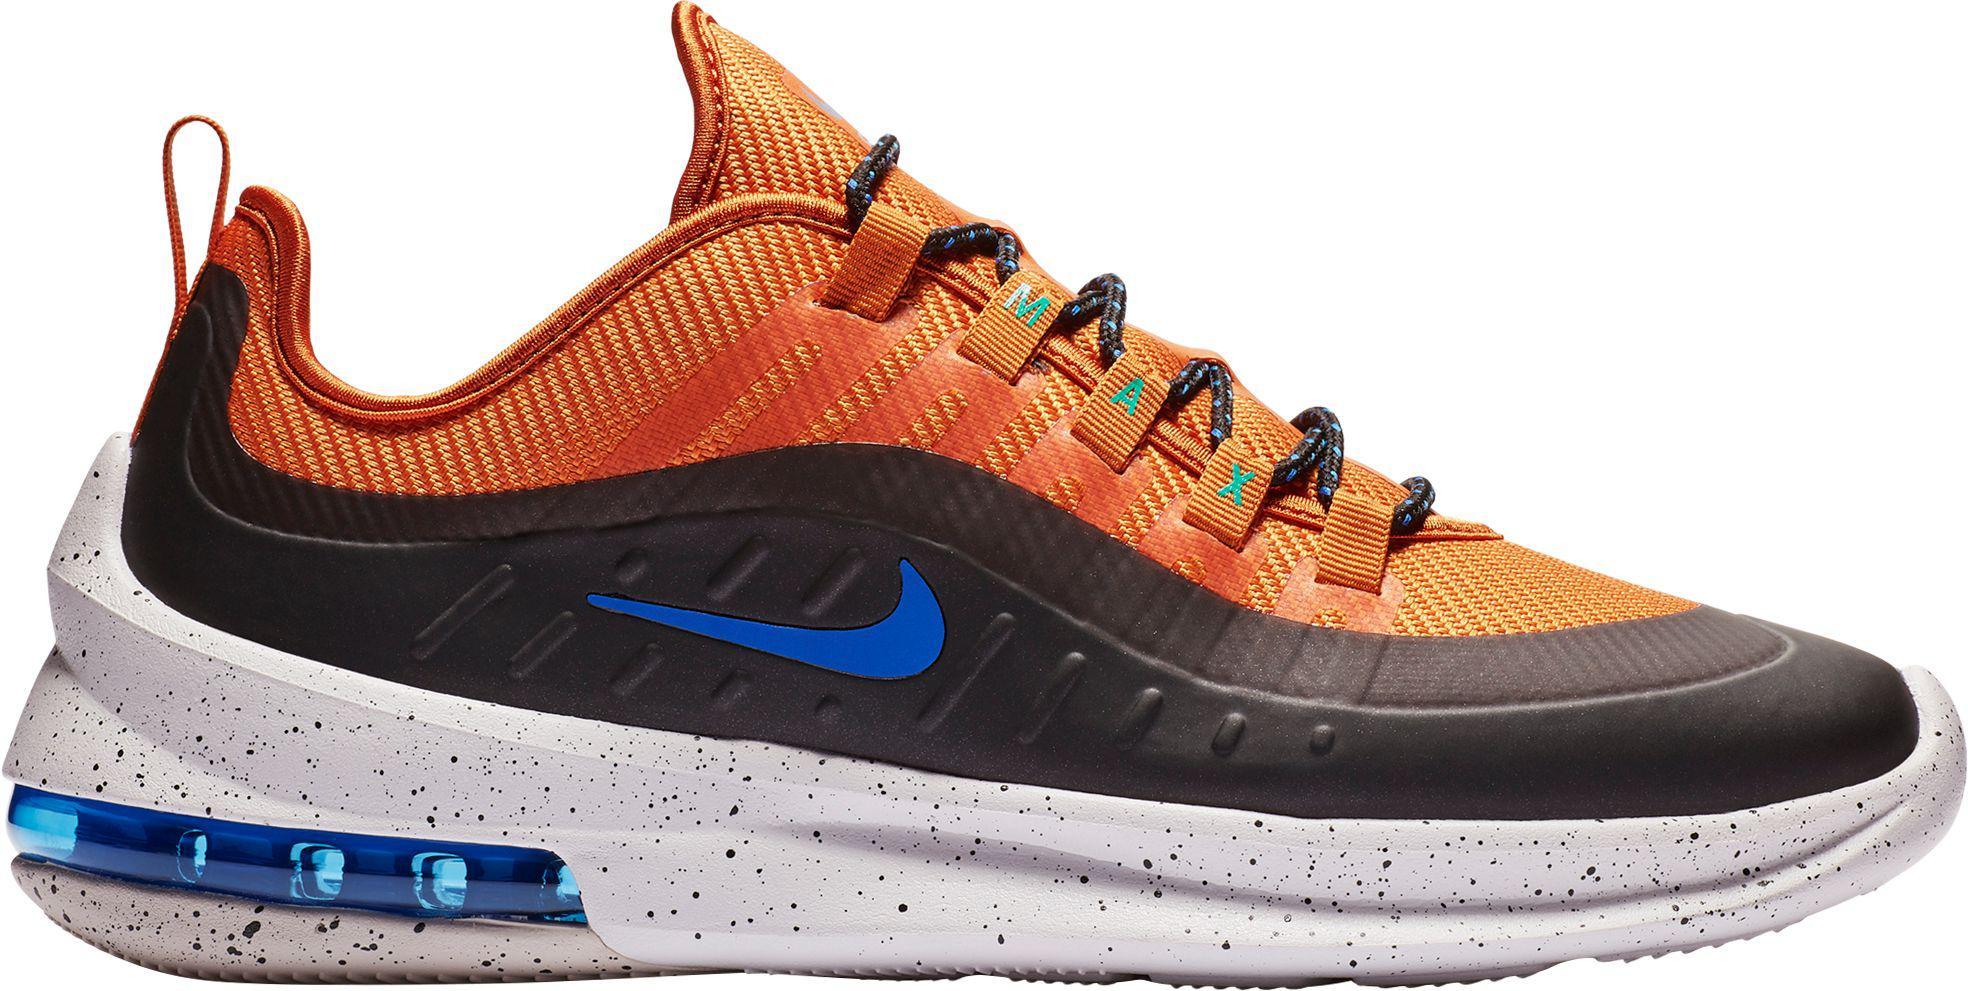 promo code e7197 8b5aa Nike Air Max Axis Premium Shoes in Orange for Men - Lyst